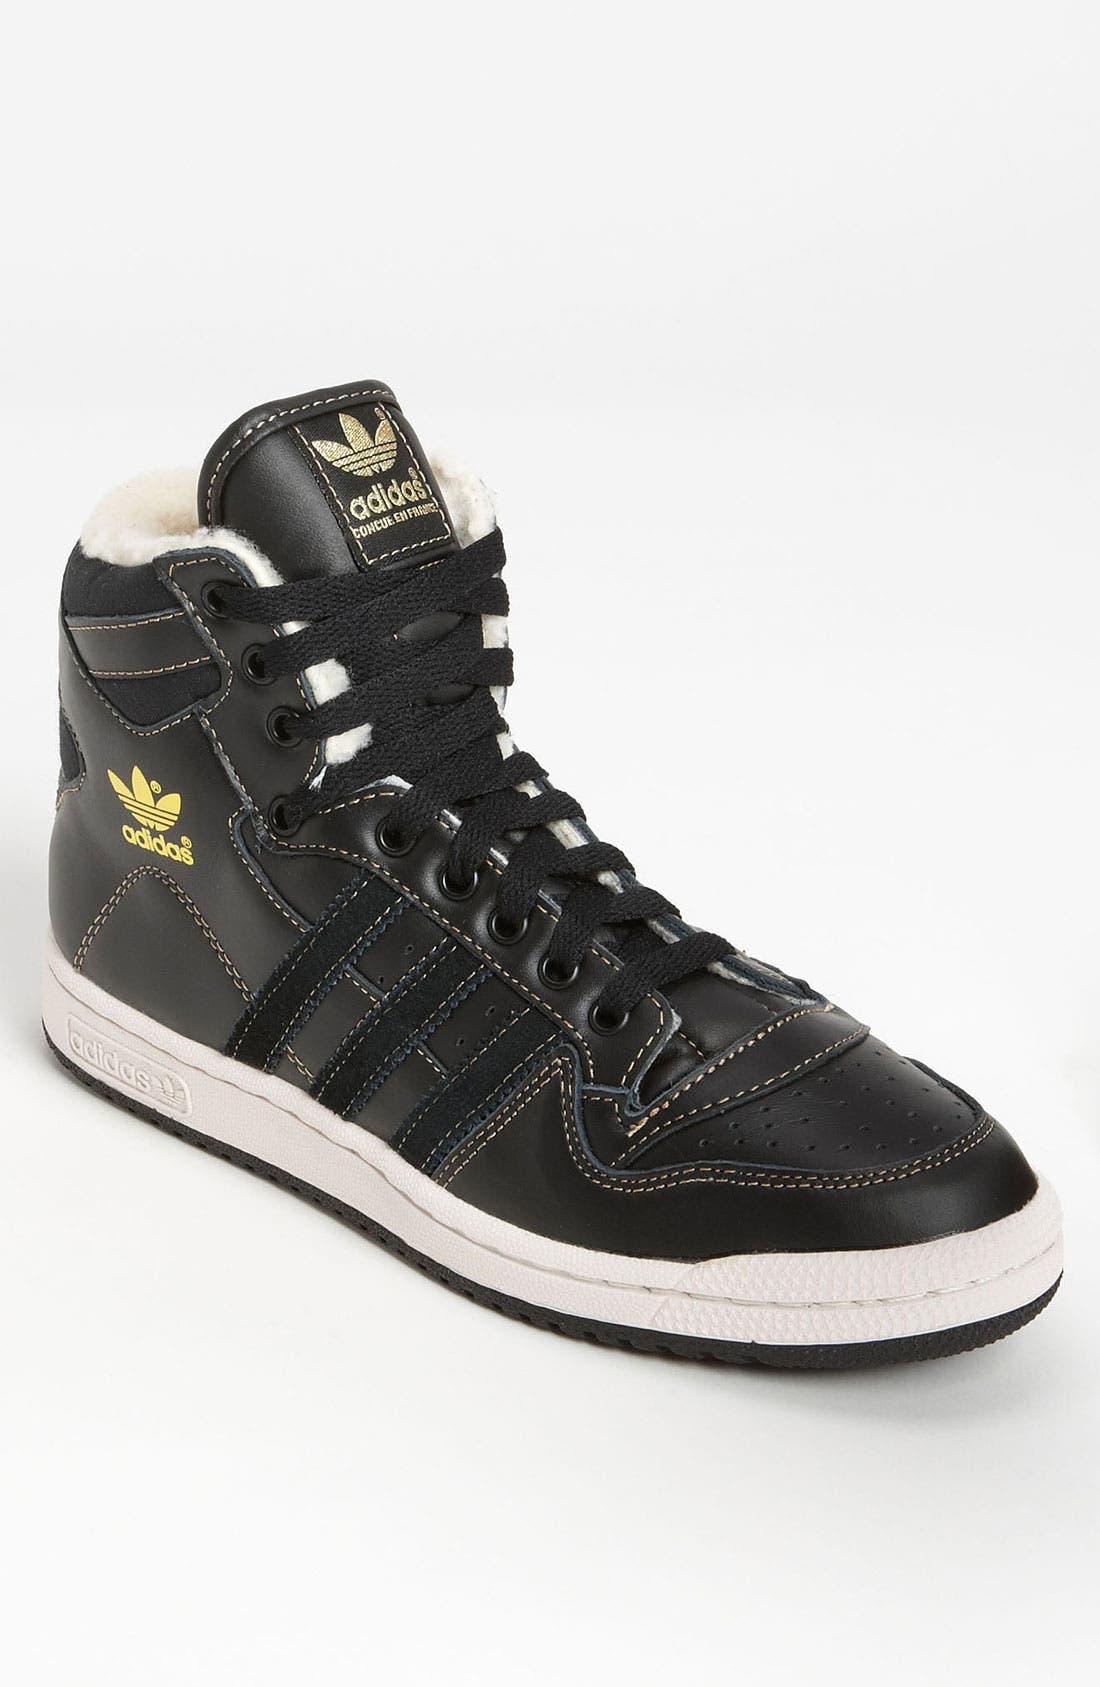 Alternate Image 1 Selected - adidas 'Decade OG Mid' Sneaker (Men) (Online Only)